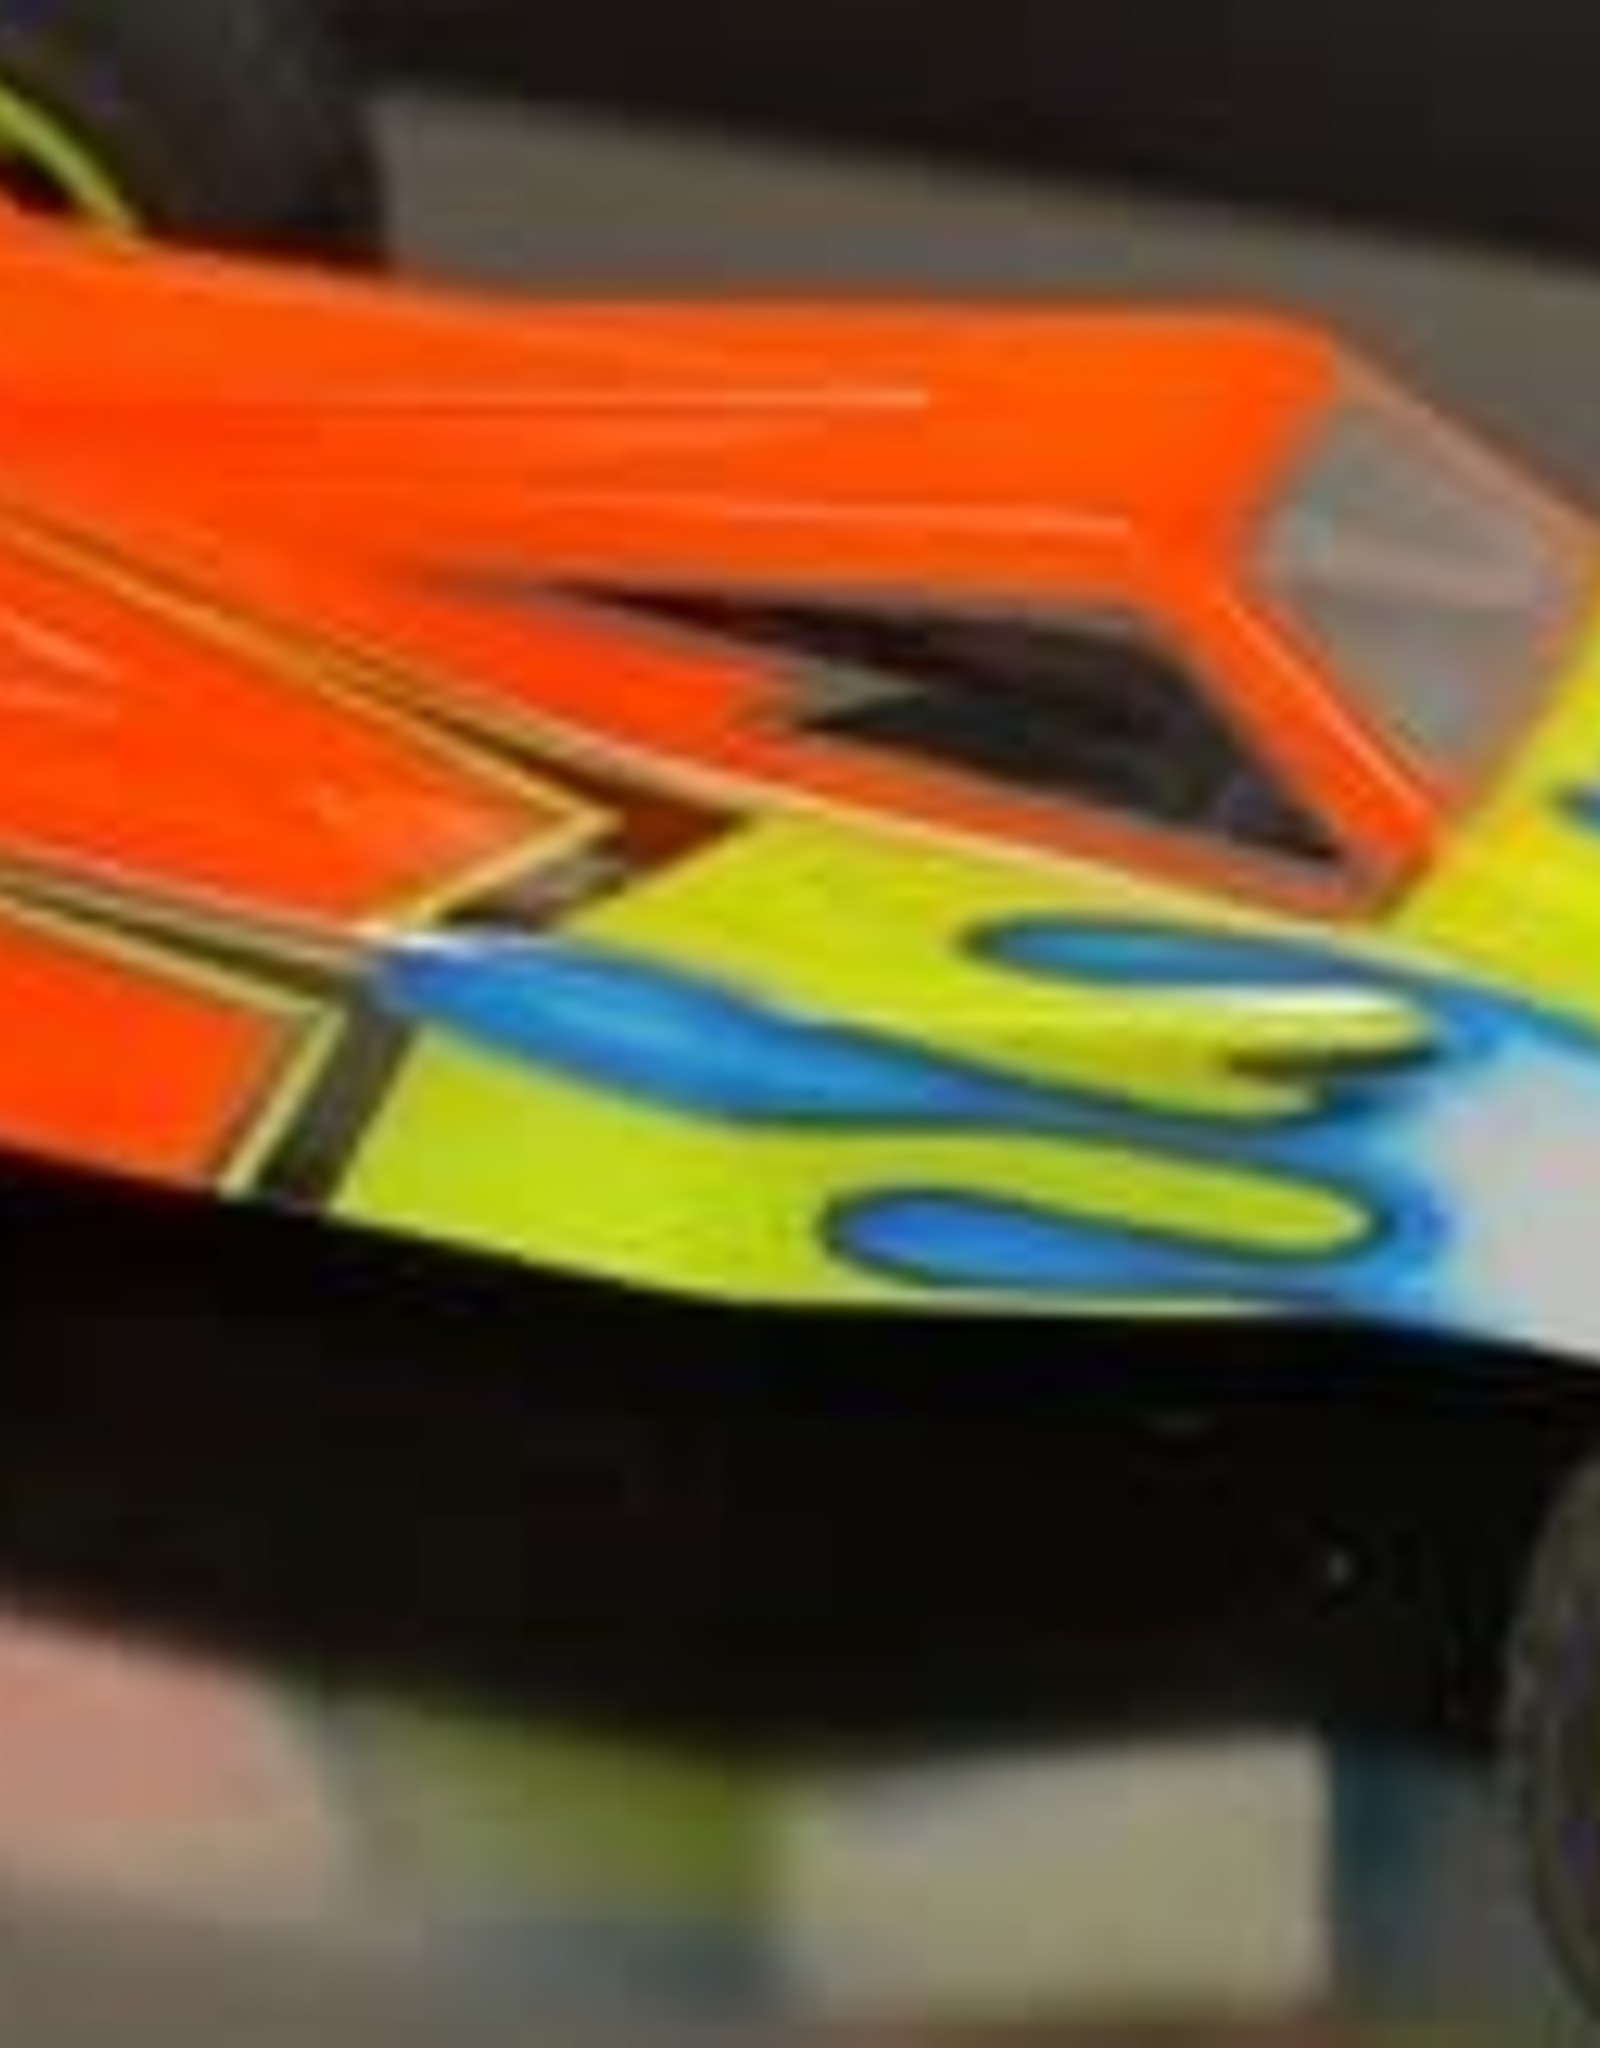 Raw Speed RS-2 1/10 Buggy Body RC10 B6.2 (Lightweight) RWS780104LW